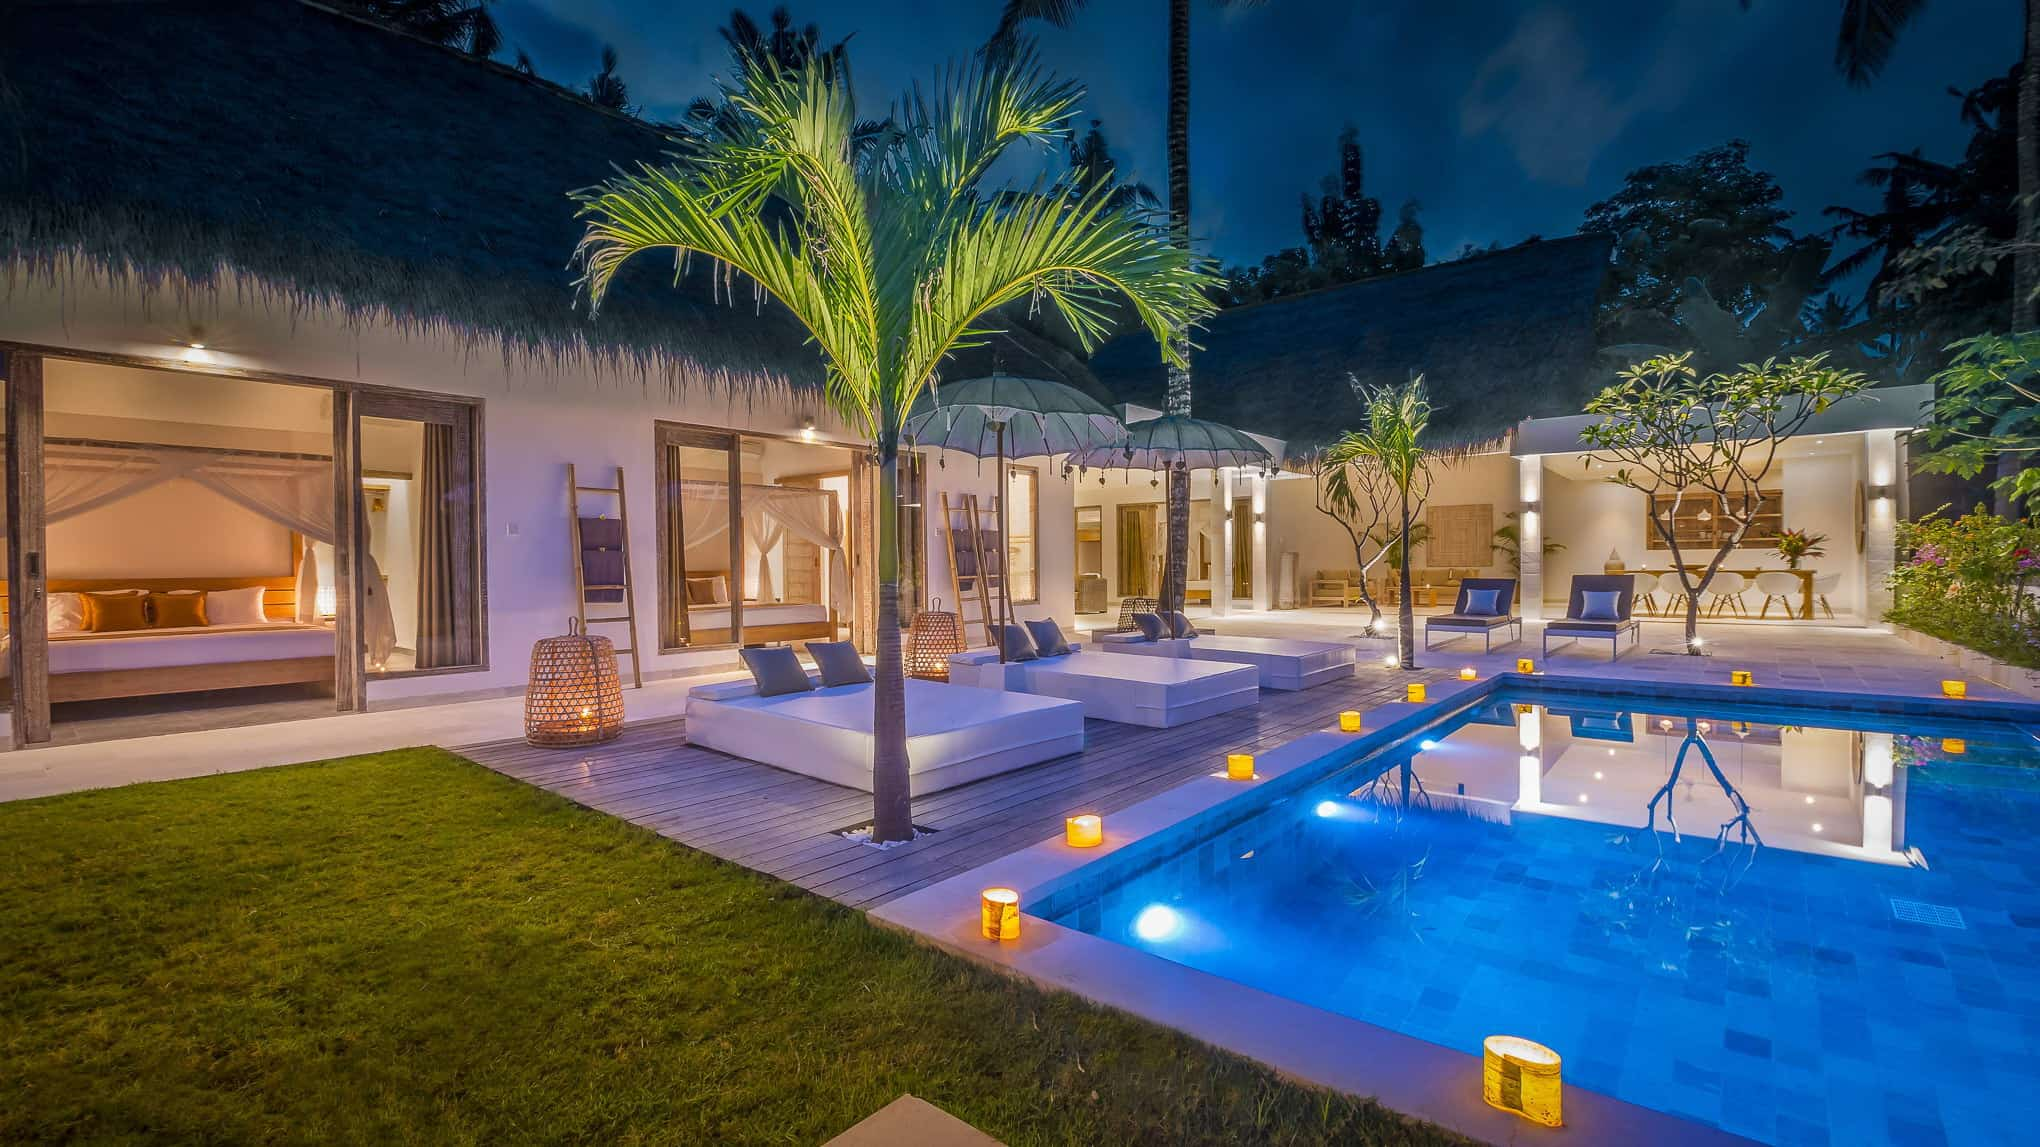 villa-hidden-jewel-bali-vacation-homes-02